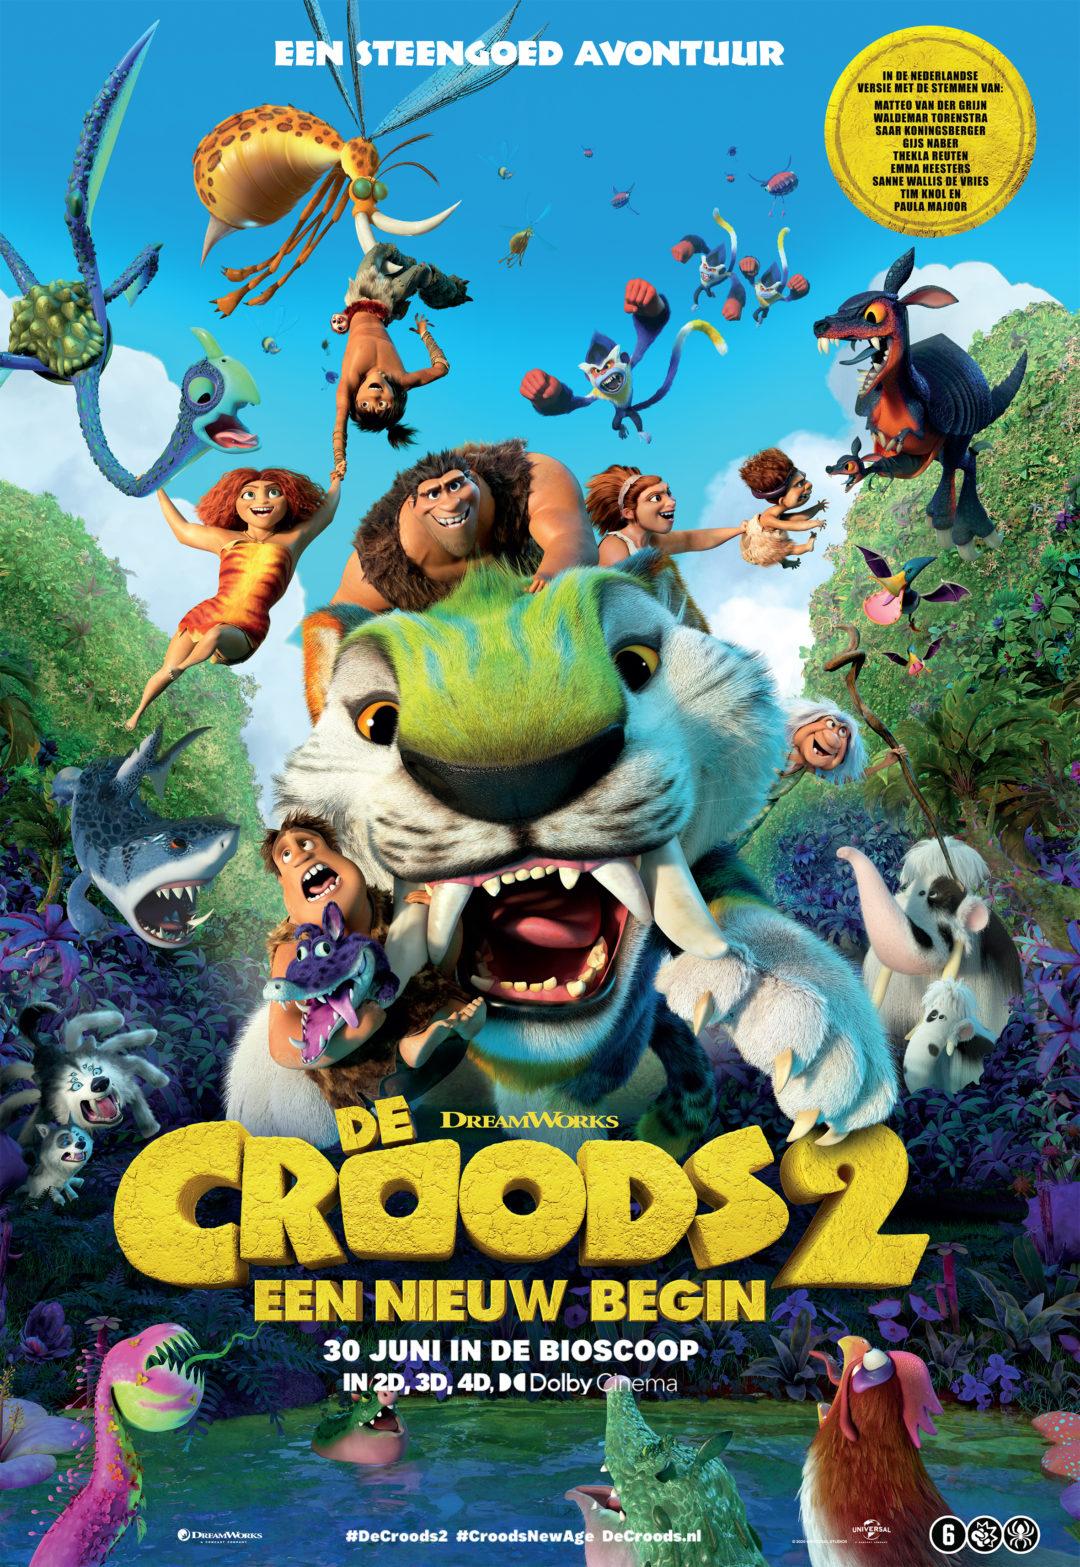 De-Croods-2_-Een-nieuw-begin_ps_1_jpg_sd-high_Copyright-2020-DreamWorks-Animation-LLC-All-Rights-Reserved.jpg